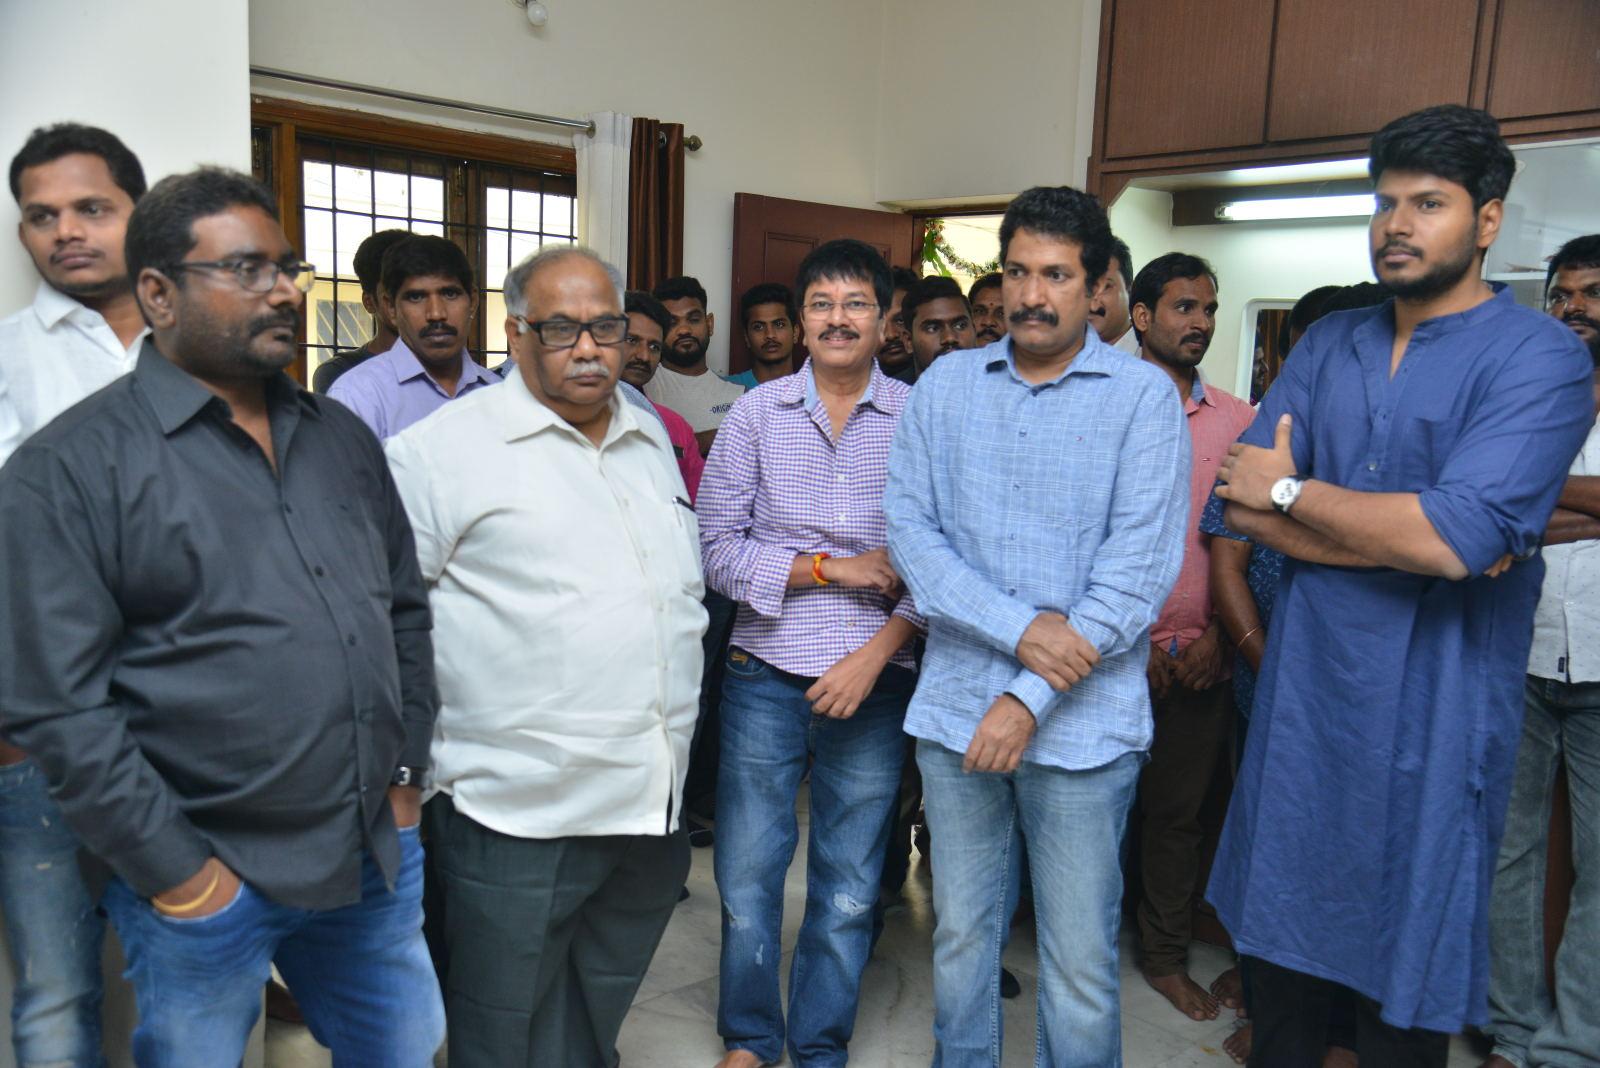 Tenali Ramakrishna BA BL - SNS Creations Production No 1 Launched